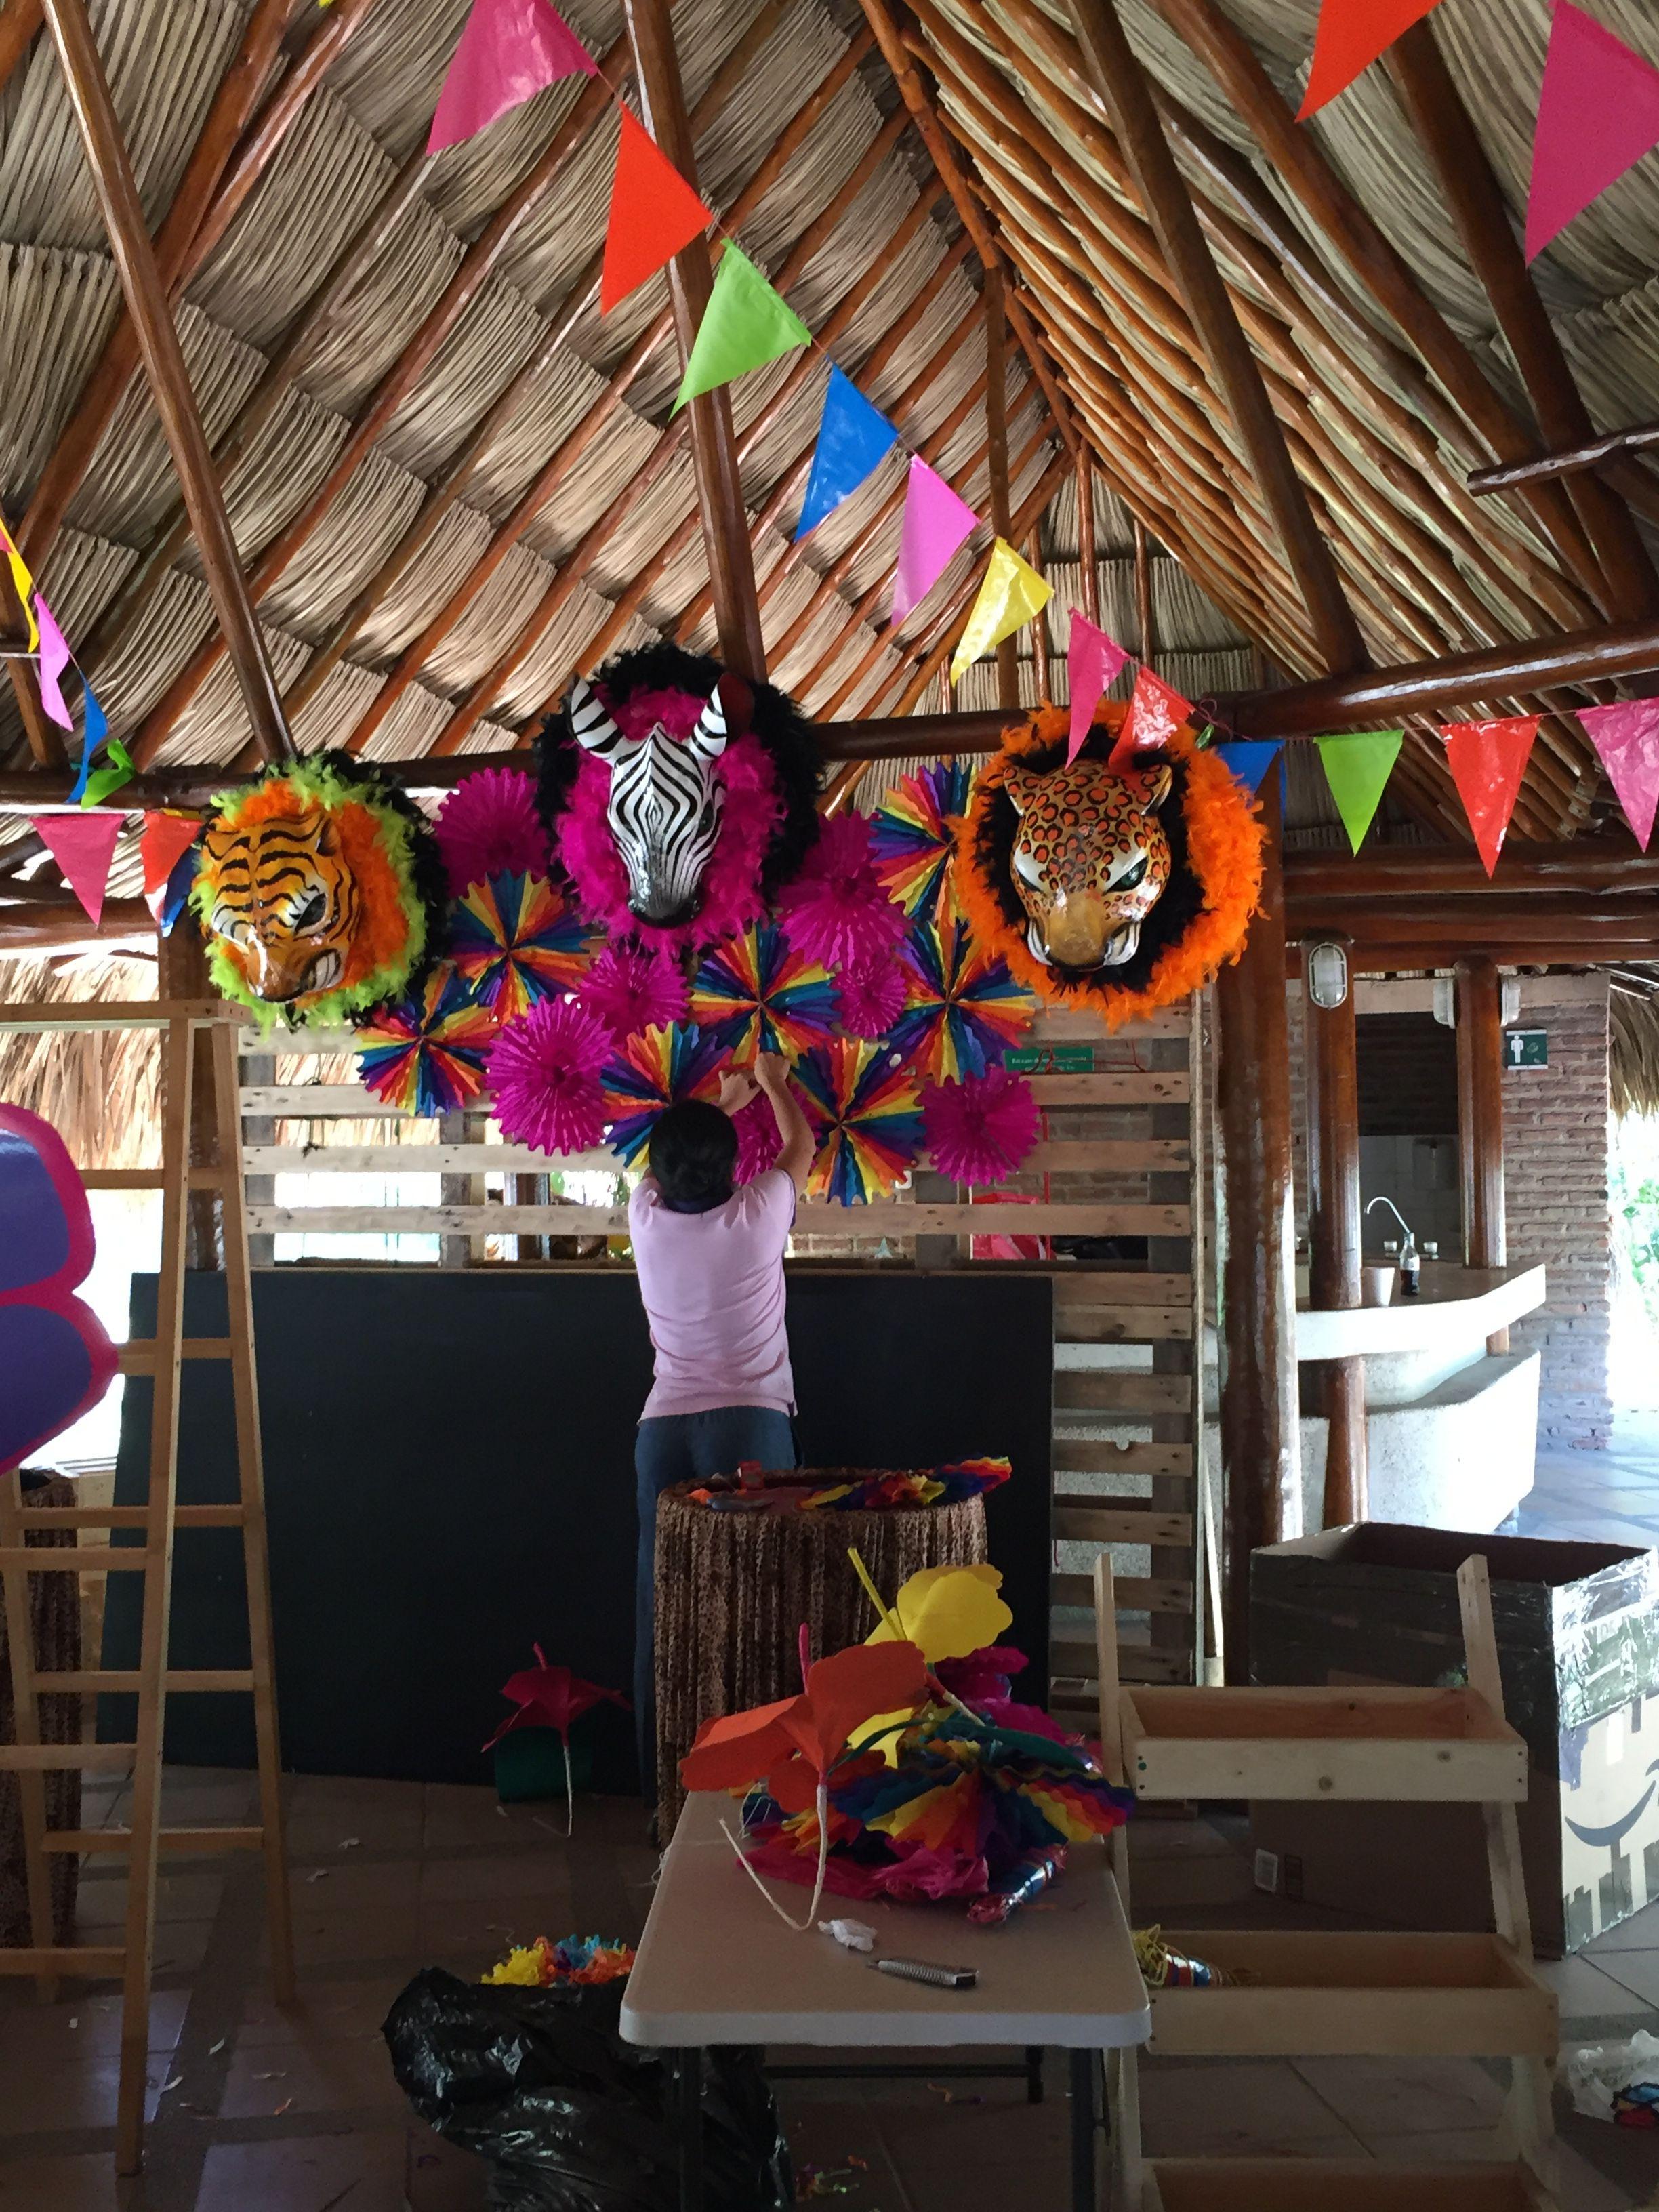 Pin De Vidafiestascg En Carnaval De Barranquilla Fiestas